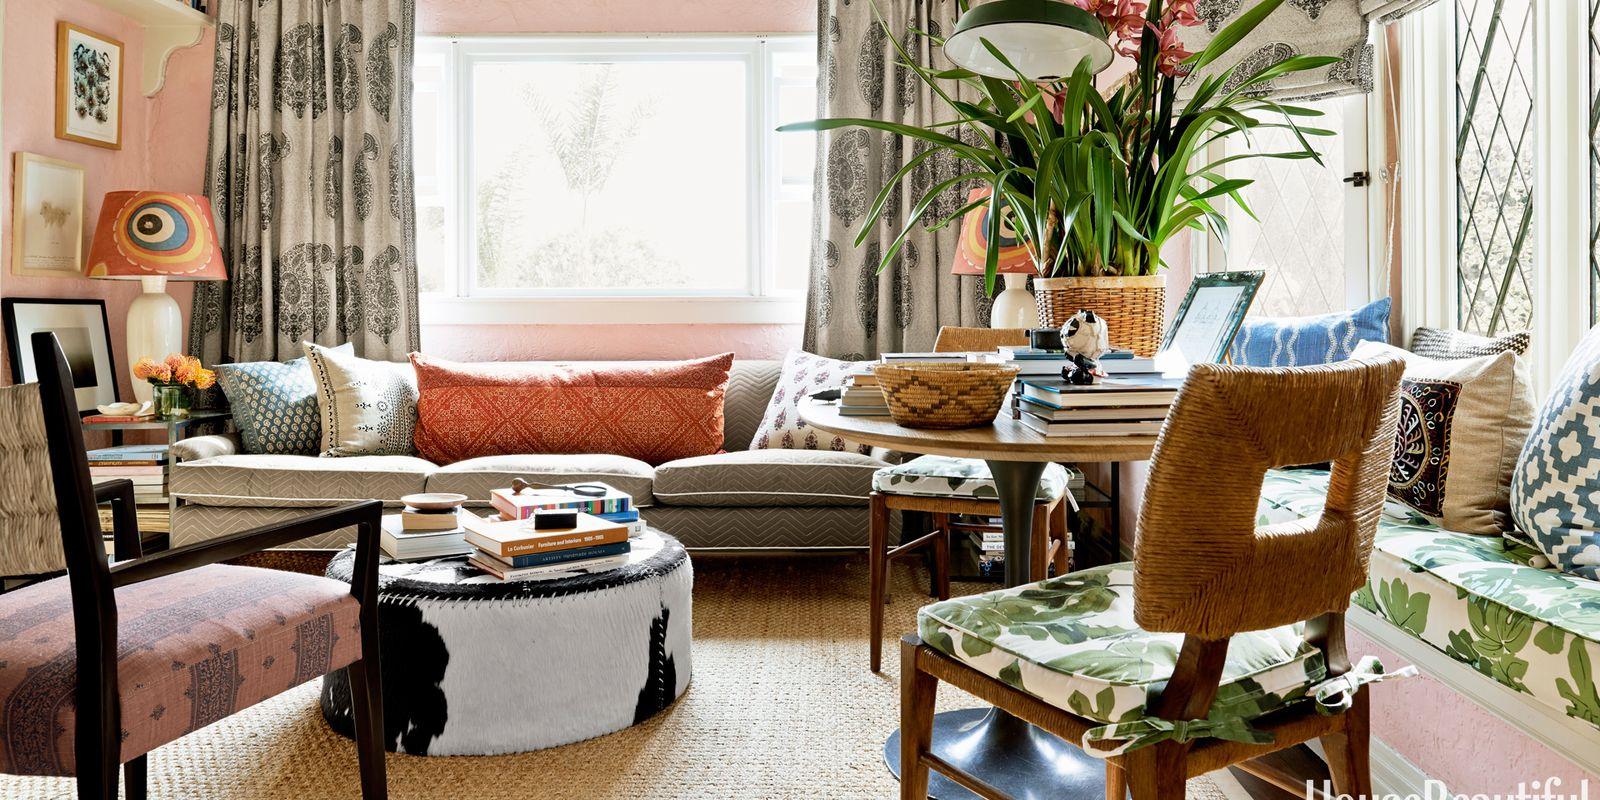 peter dunham los angeles apartment 550 square foot apartment. Black Bedroom Furniture Sets. Home Design Ideas